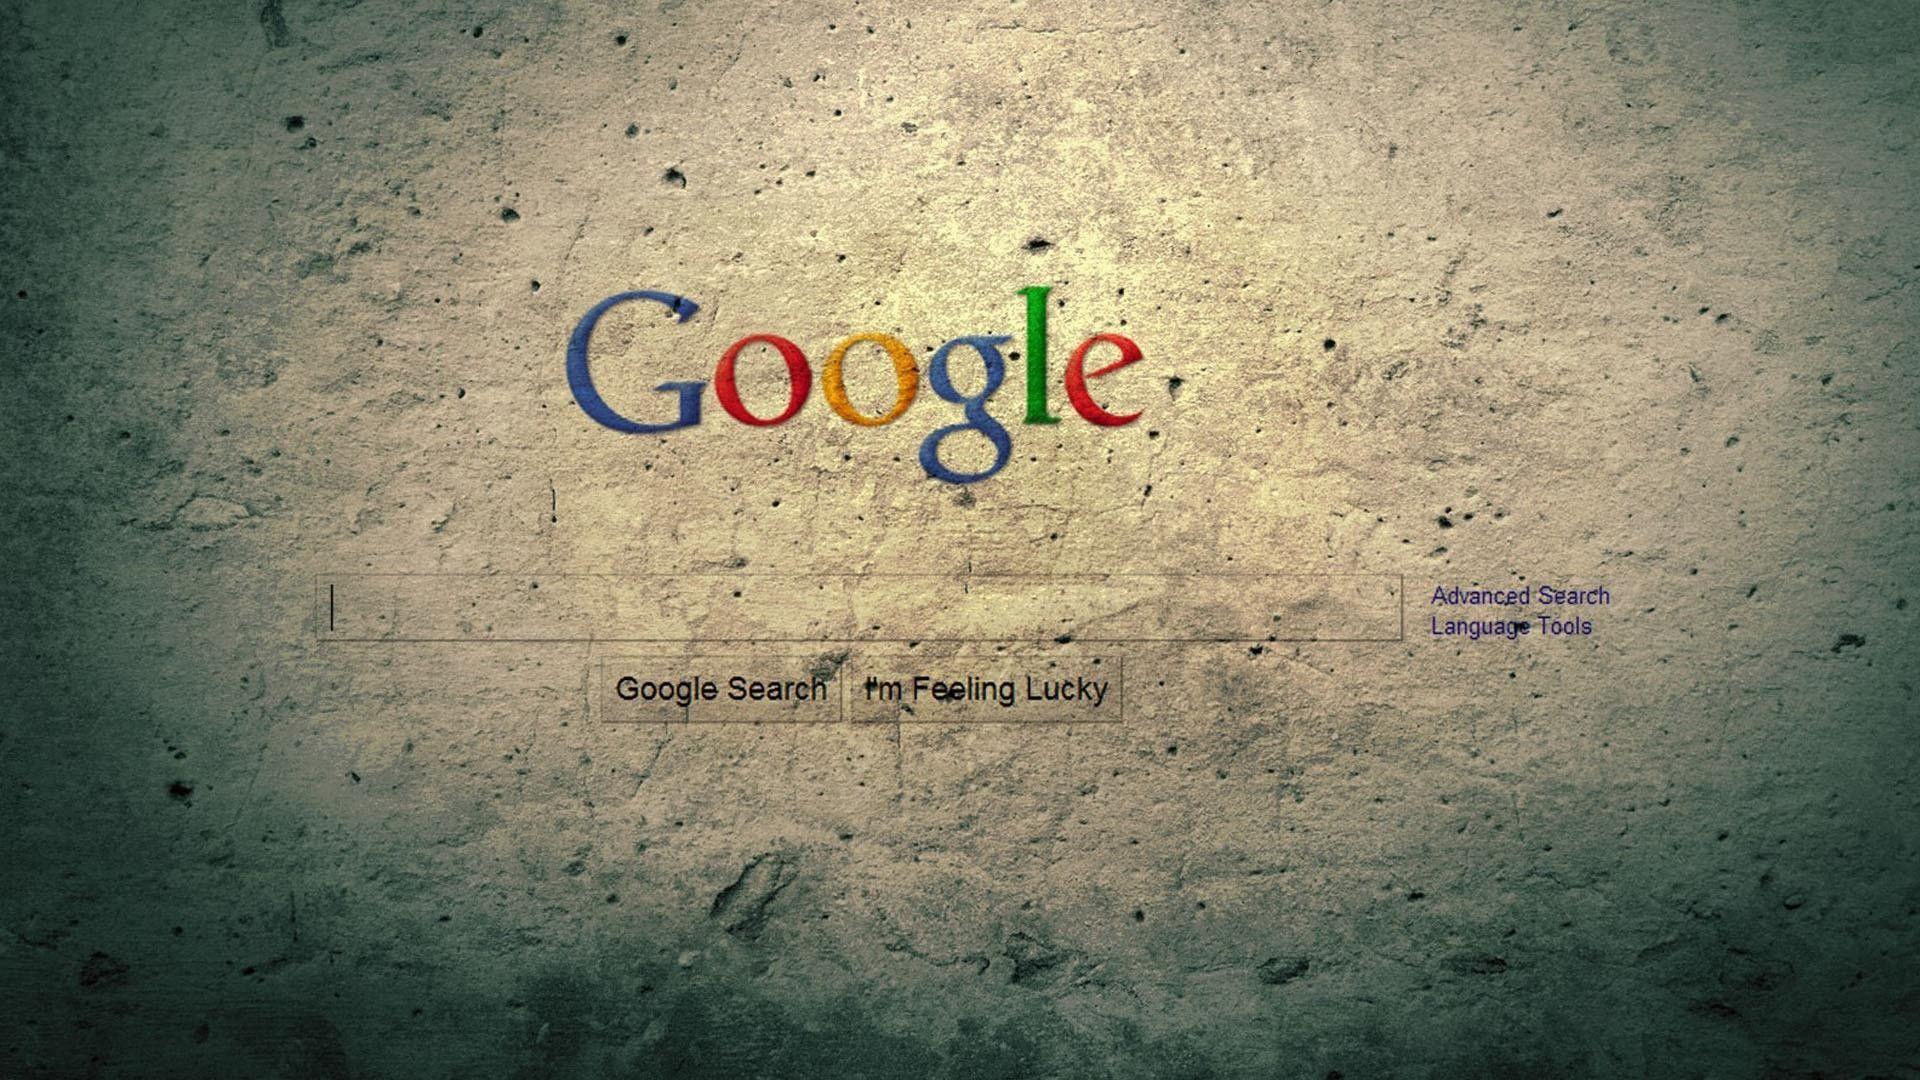 1920x1080 GoogleGrungeAbstractHD1080pWallpapers Hd